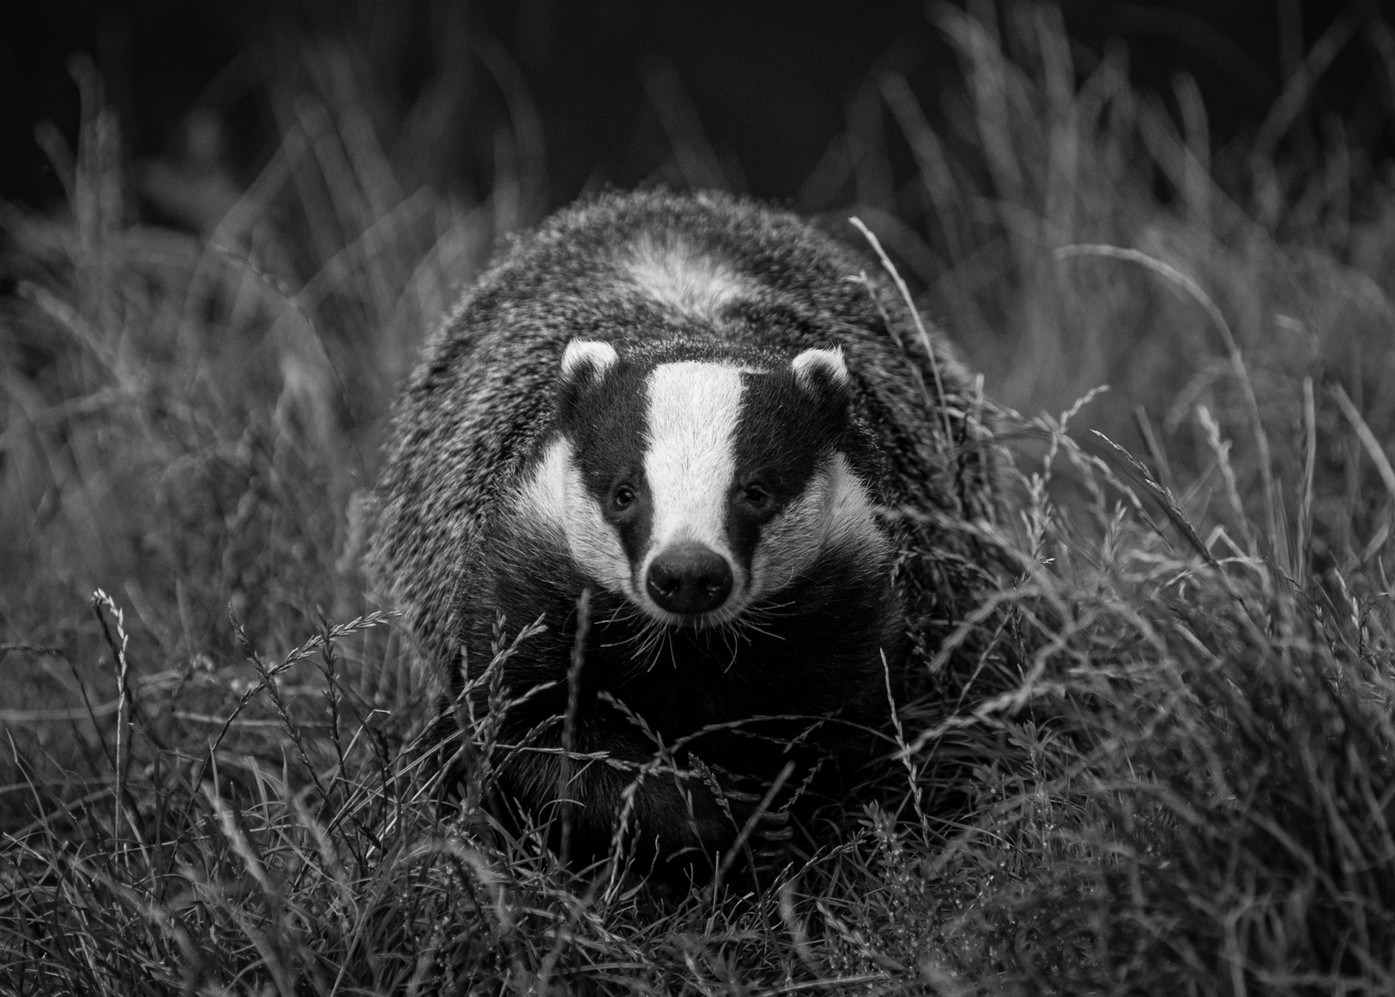 2008.08.23_BWC_British Wildlife Centre_2